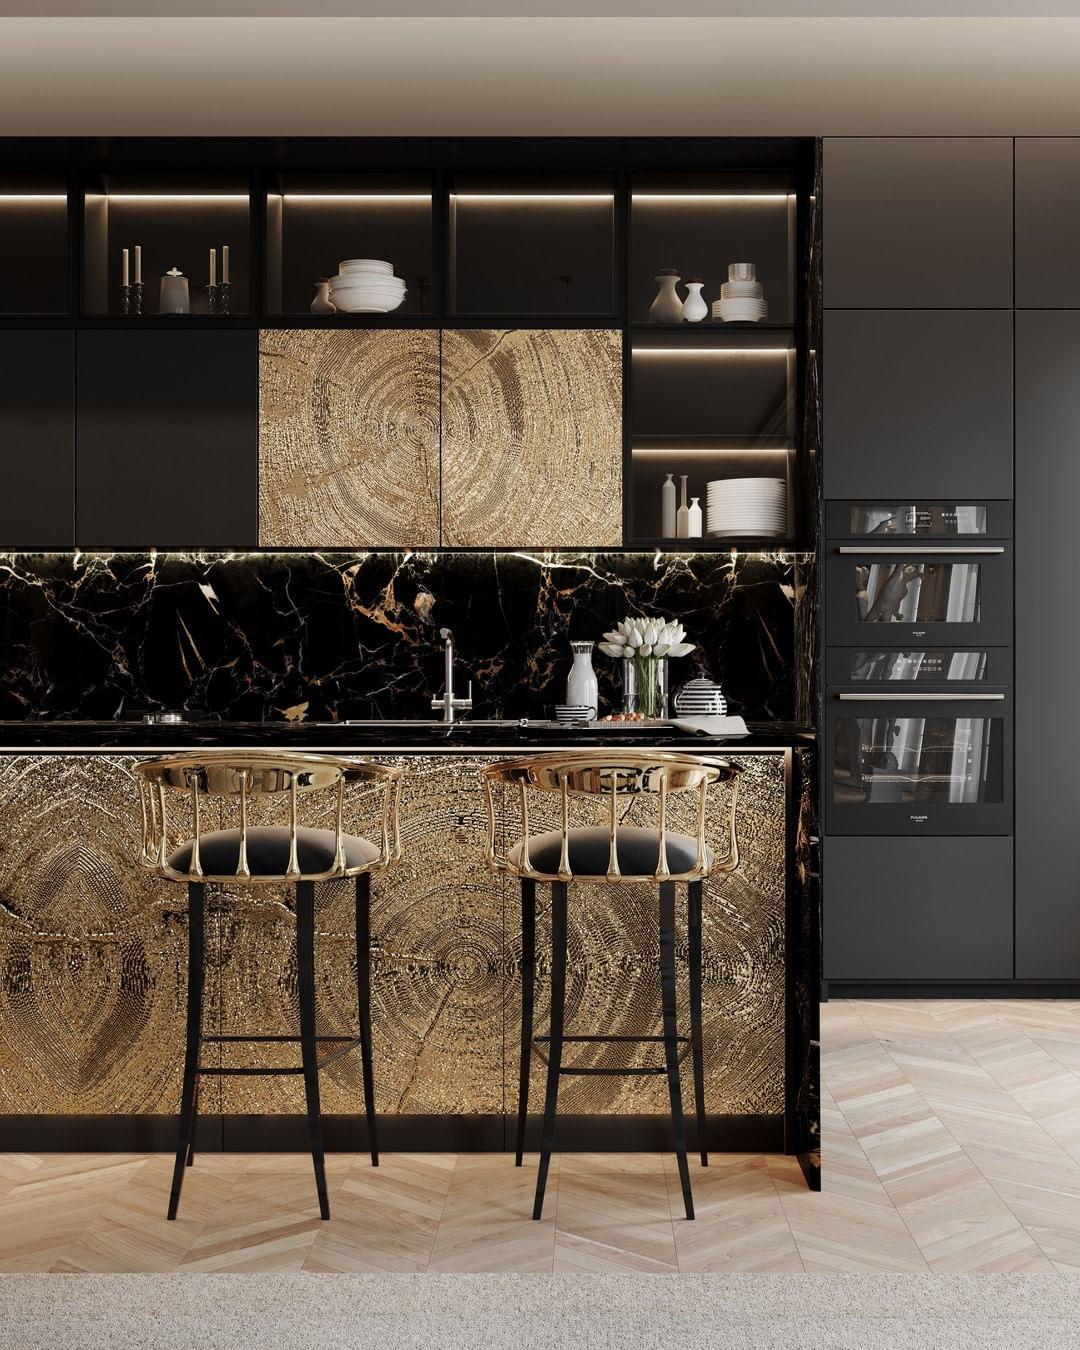 kitchen decor ideas Modern Kitchen Decor Ideas For 2021 modern kitchen decor ideas for 2021 5